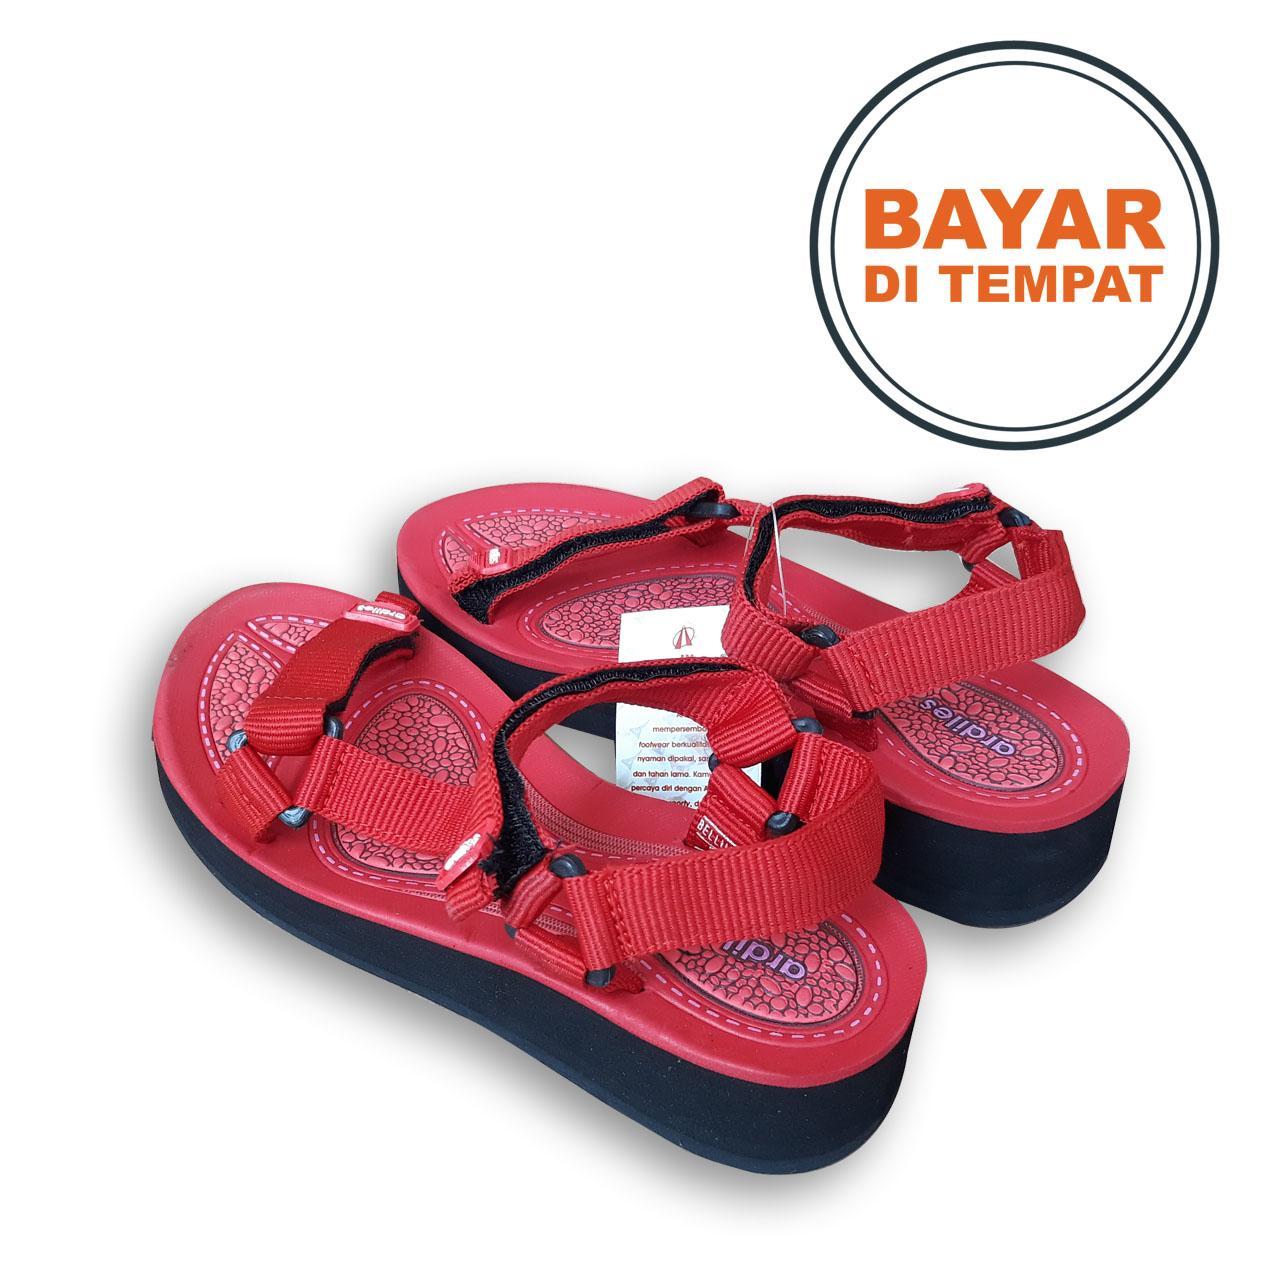 Amelia Olshop / Sandal Belluci 32-35 / sandal wanita / sandal anak wanita terbaru /  sandal anak / Sandal gunung anak